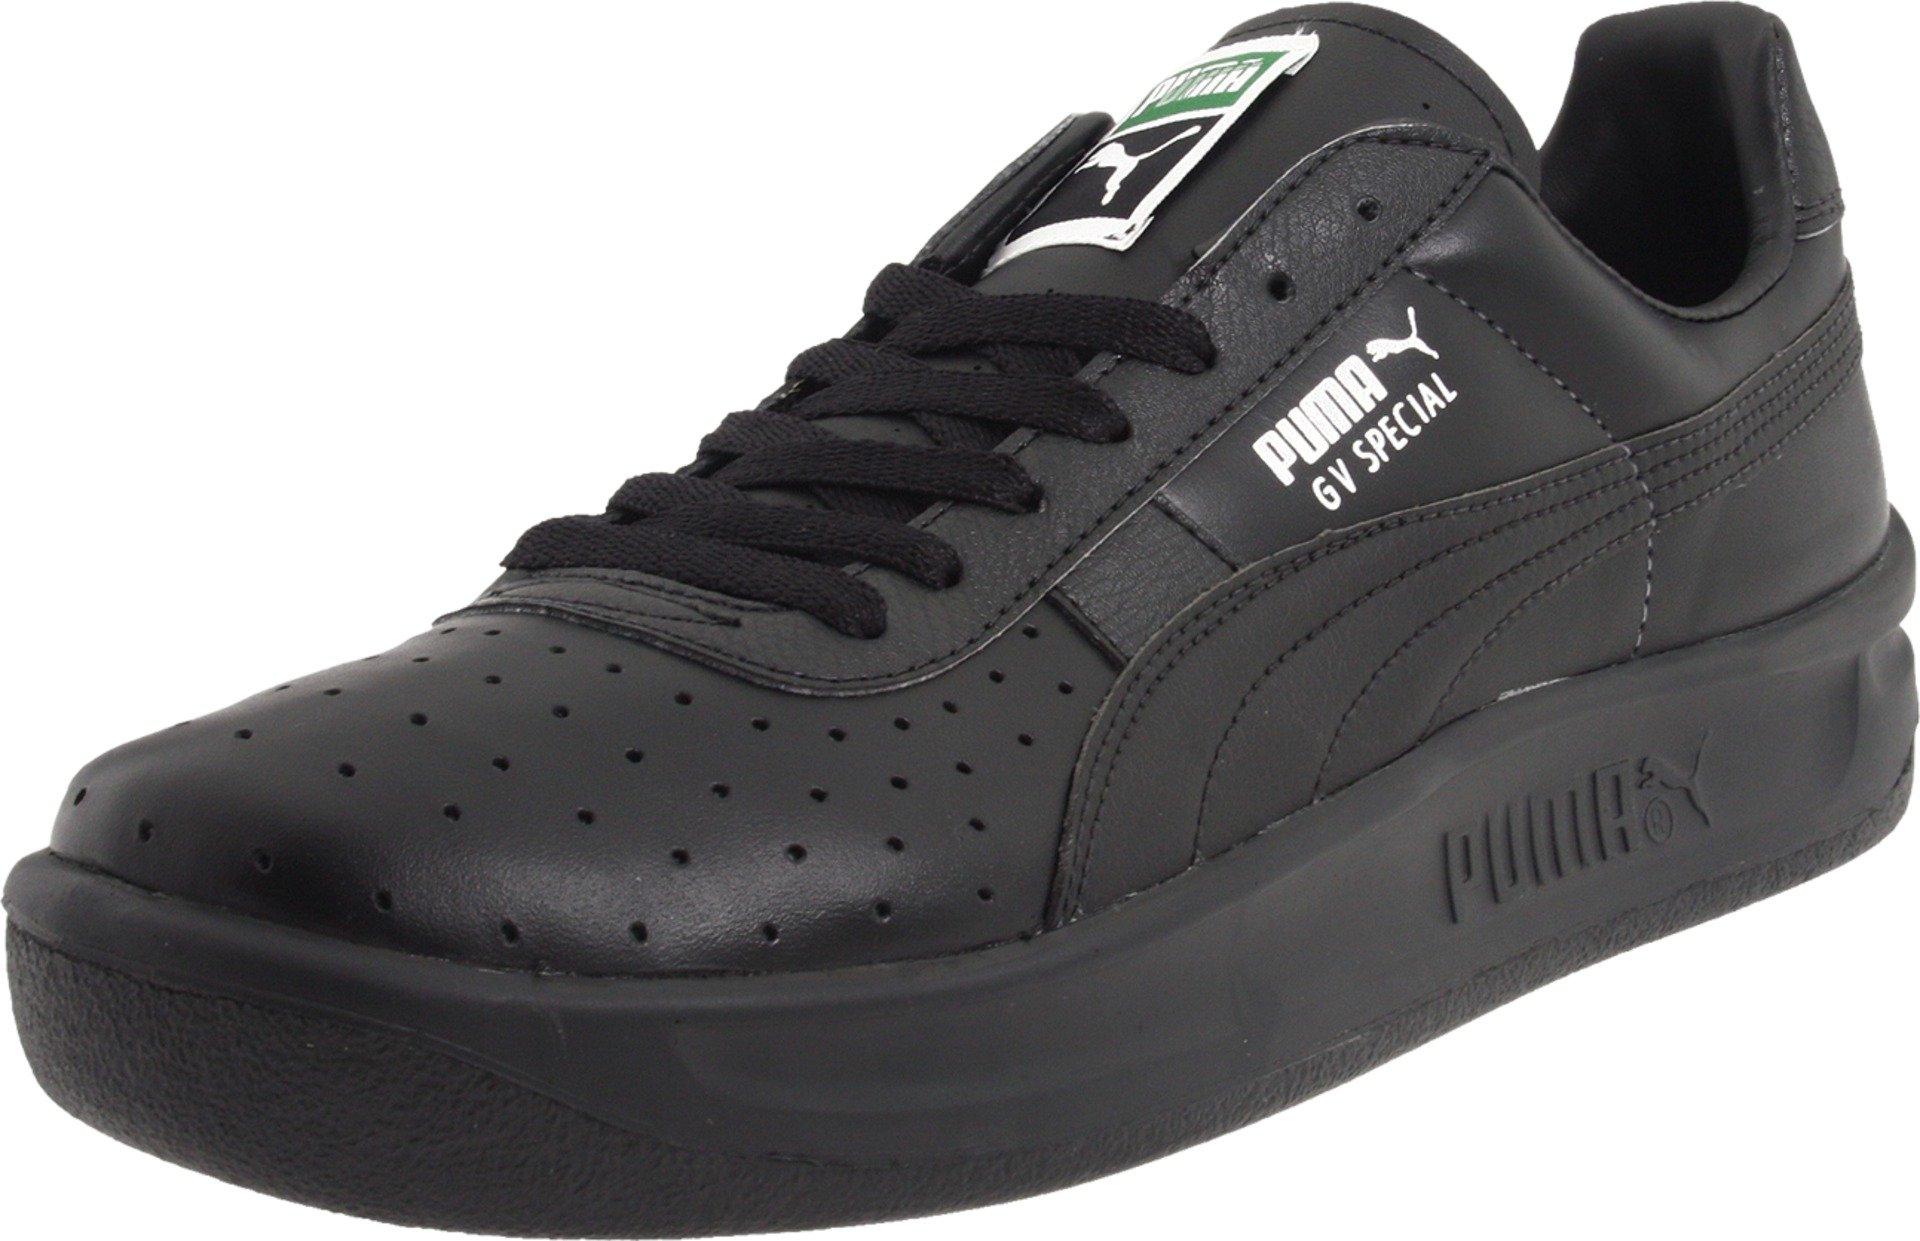 PUMA Men's GV Special Lace-Up Fashion Sneaker, Black/Black, 8.5 M US